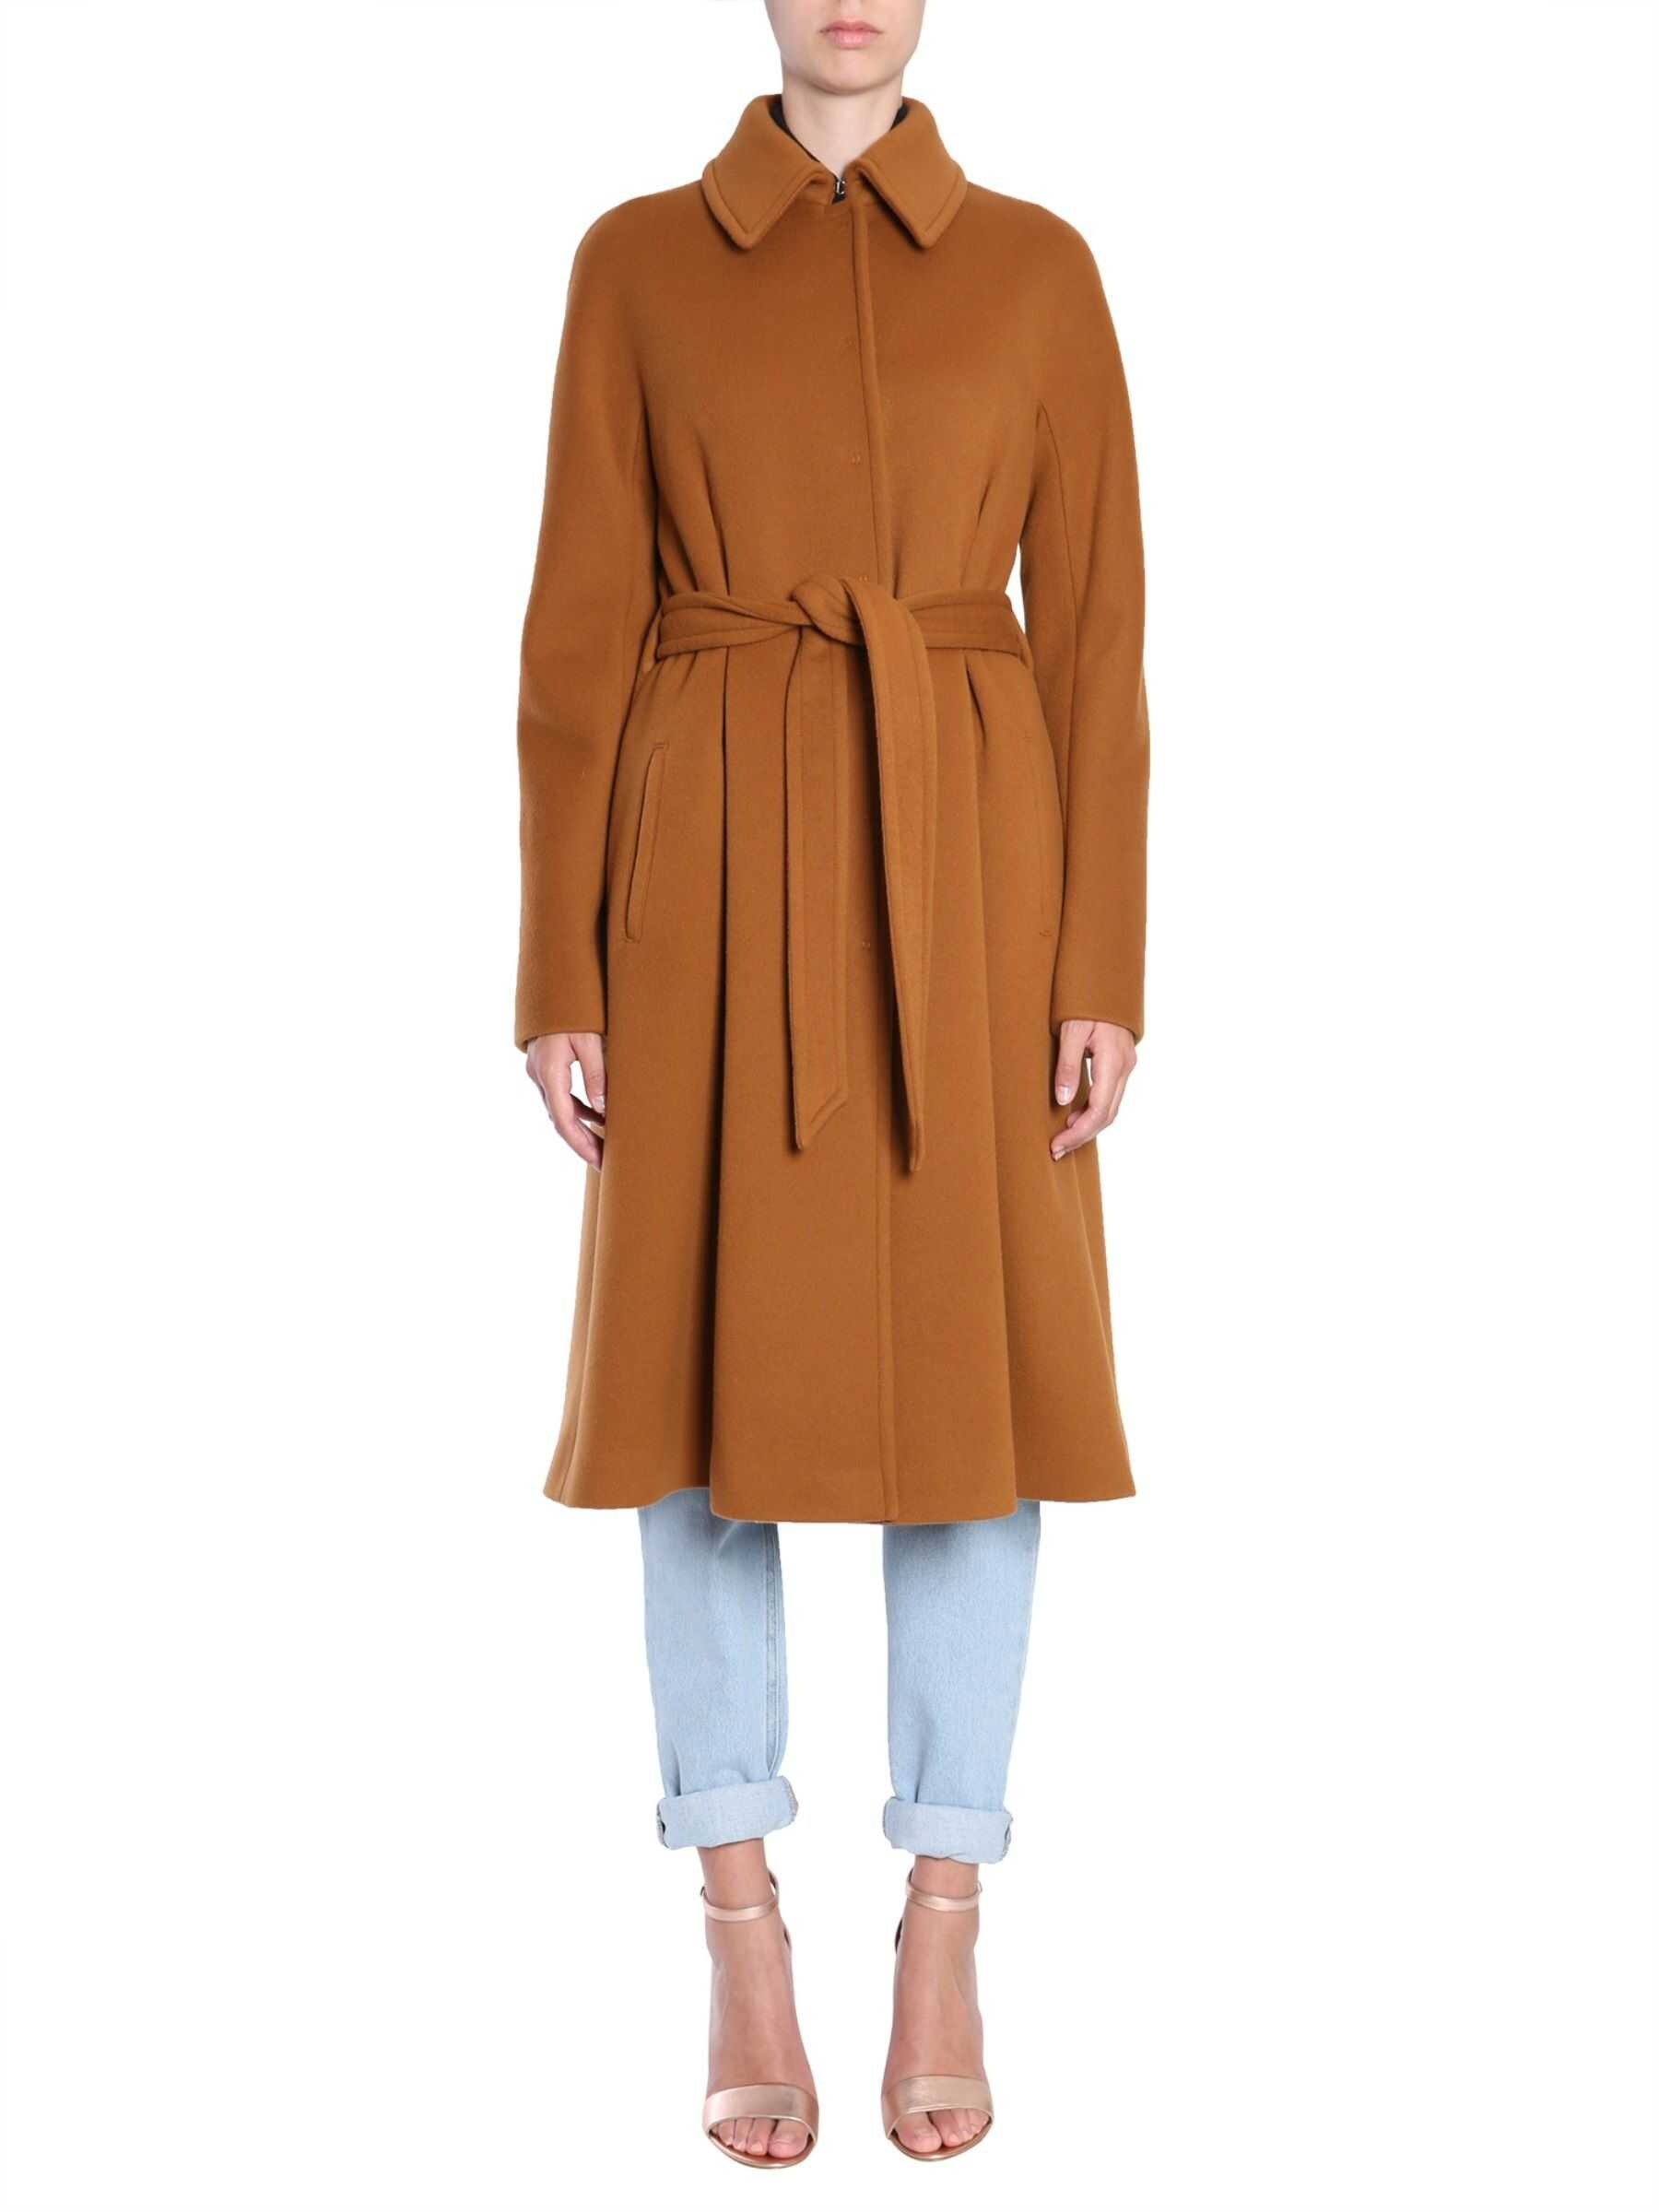 Alberta Ferretti Wool And Cashmere Coat 0611_66300098 BROWN image0